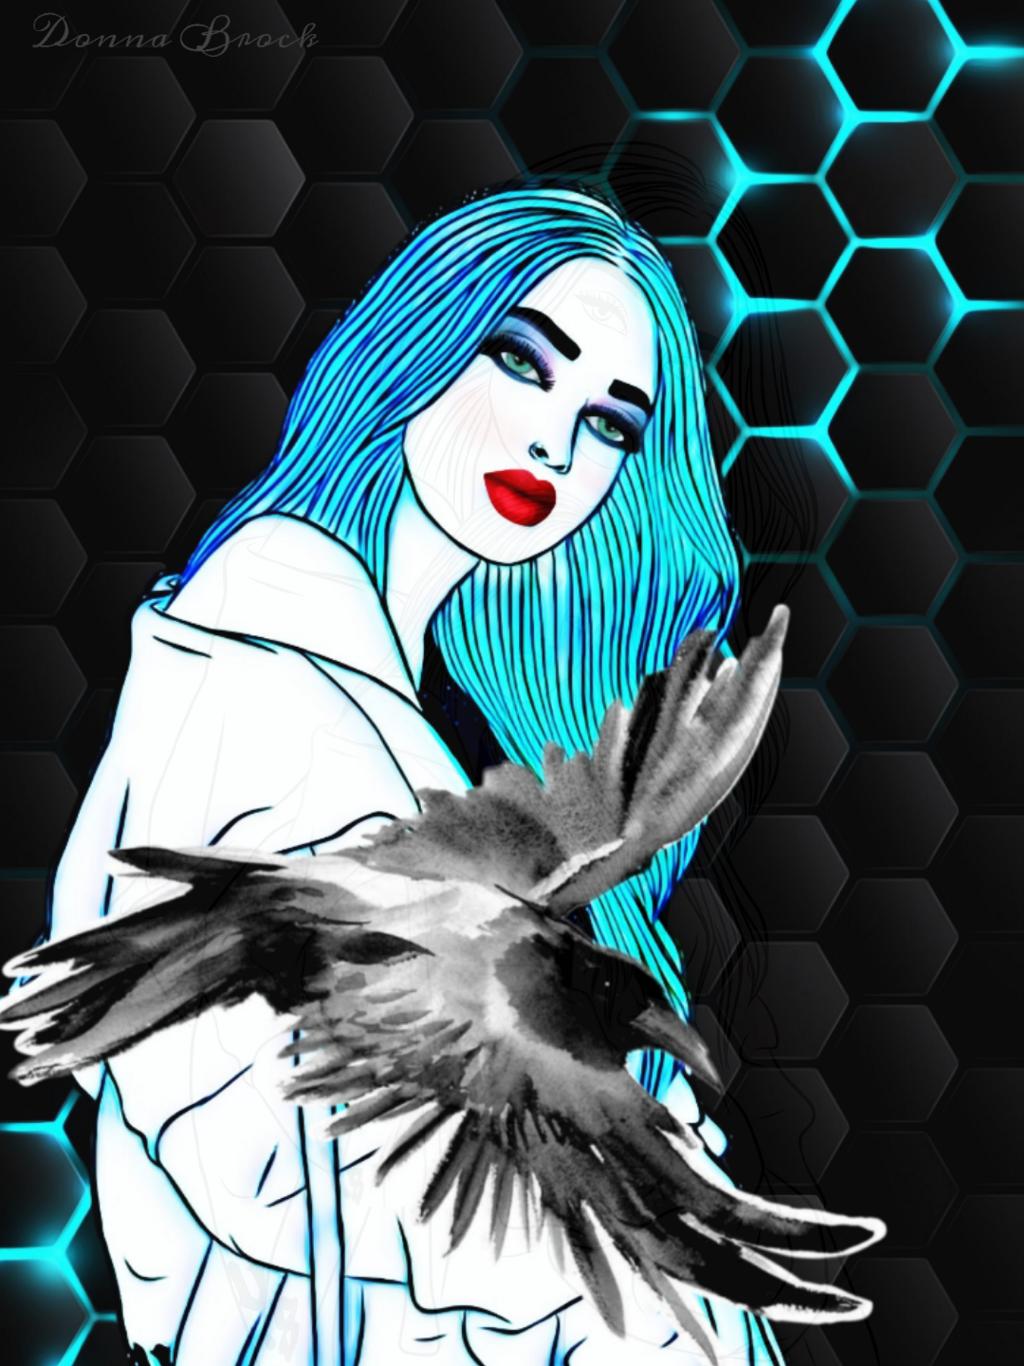 STRIKE A POSE ...     #pose #woman #girl #drawing #bird #blackbird  #crow #freetoedit  #ircpose